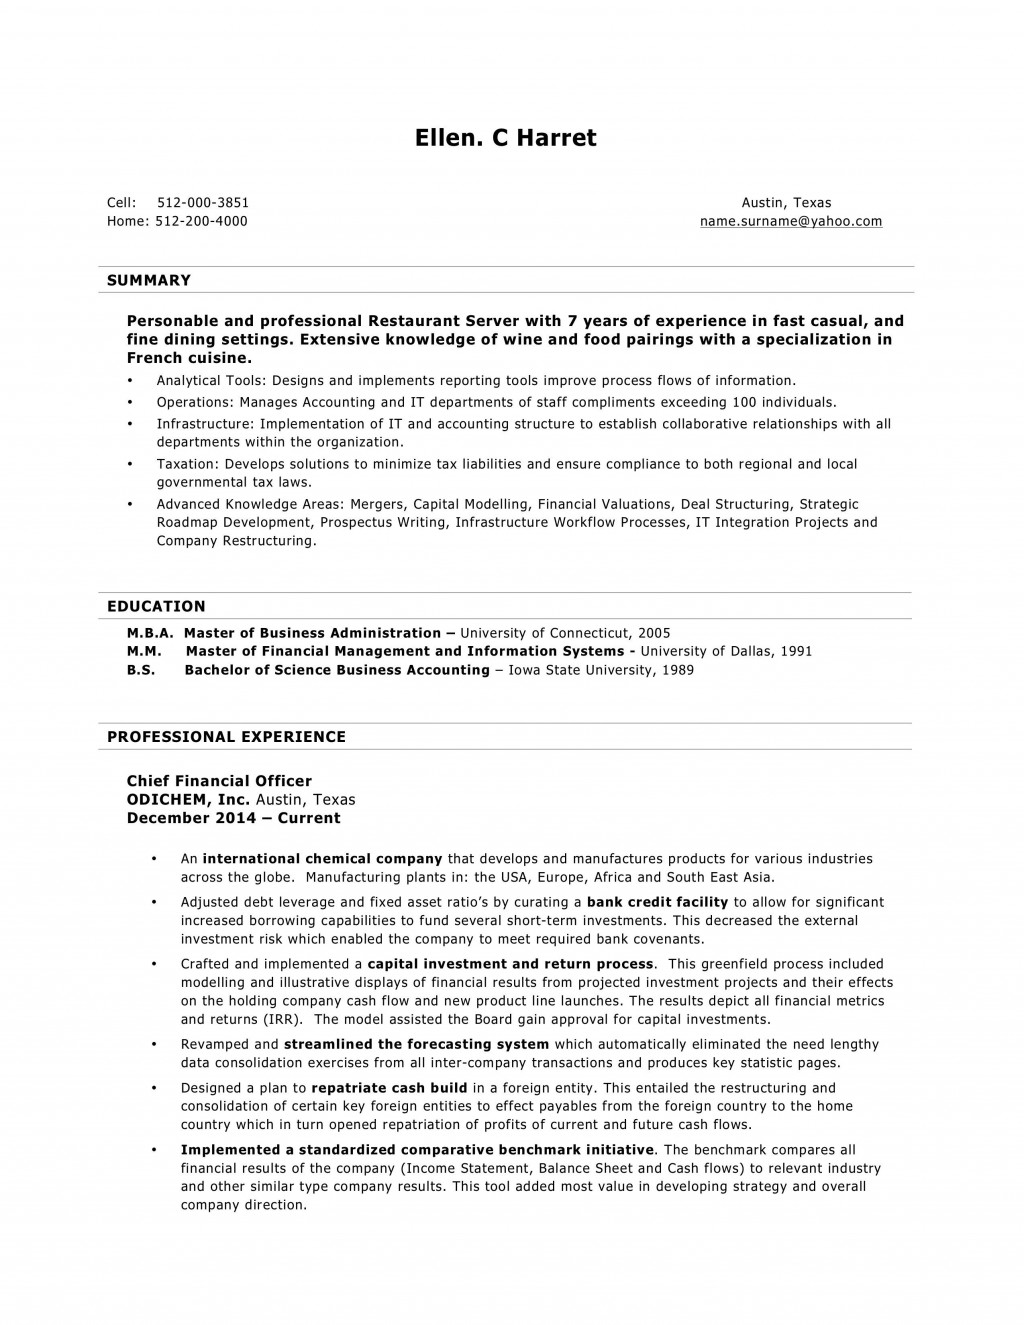 007 Best Resume Template On Microsoft Word Image  Sample 2007 Cv 2010Large